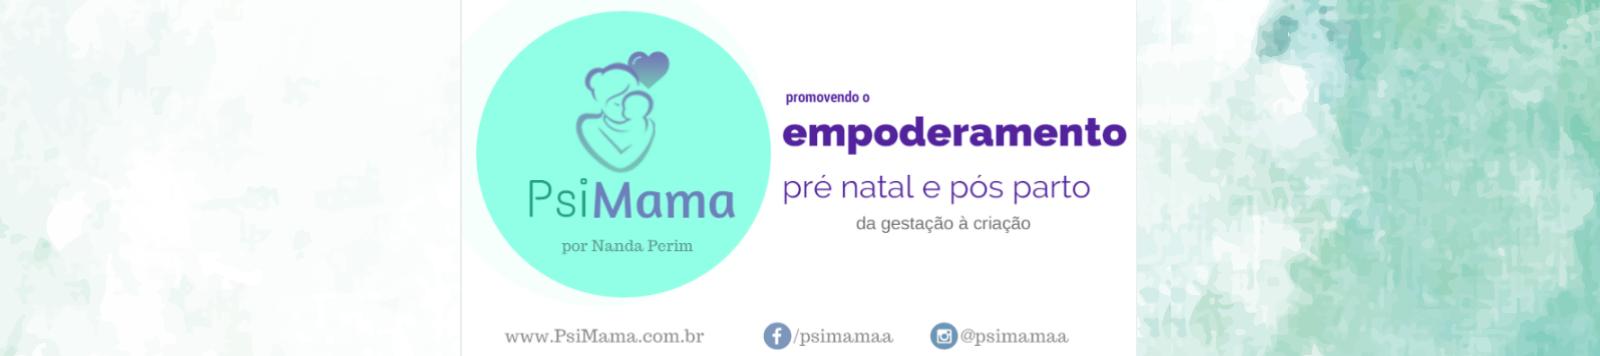 PsiMama